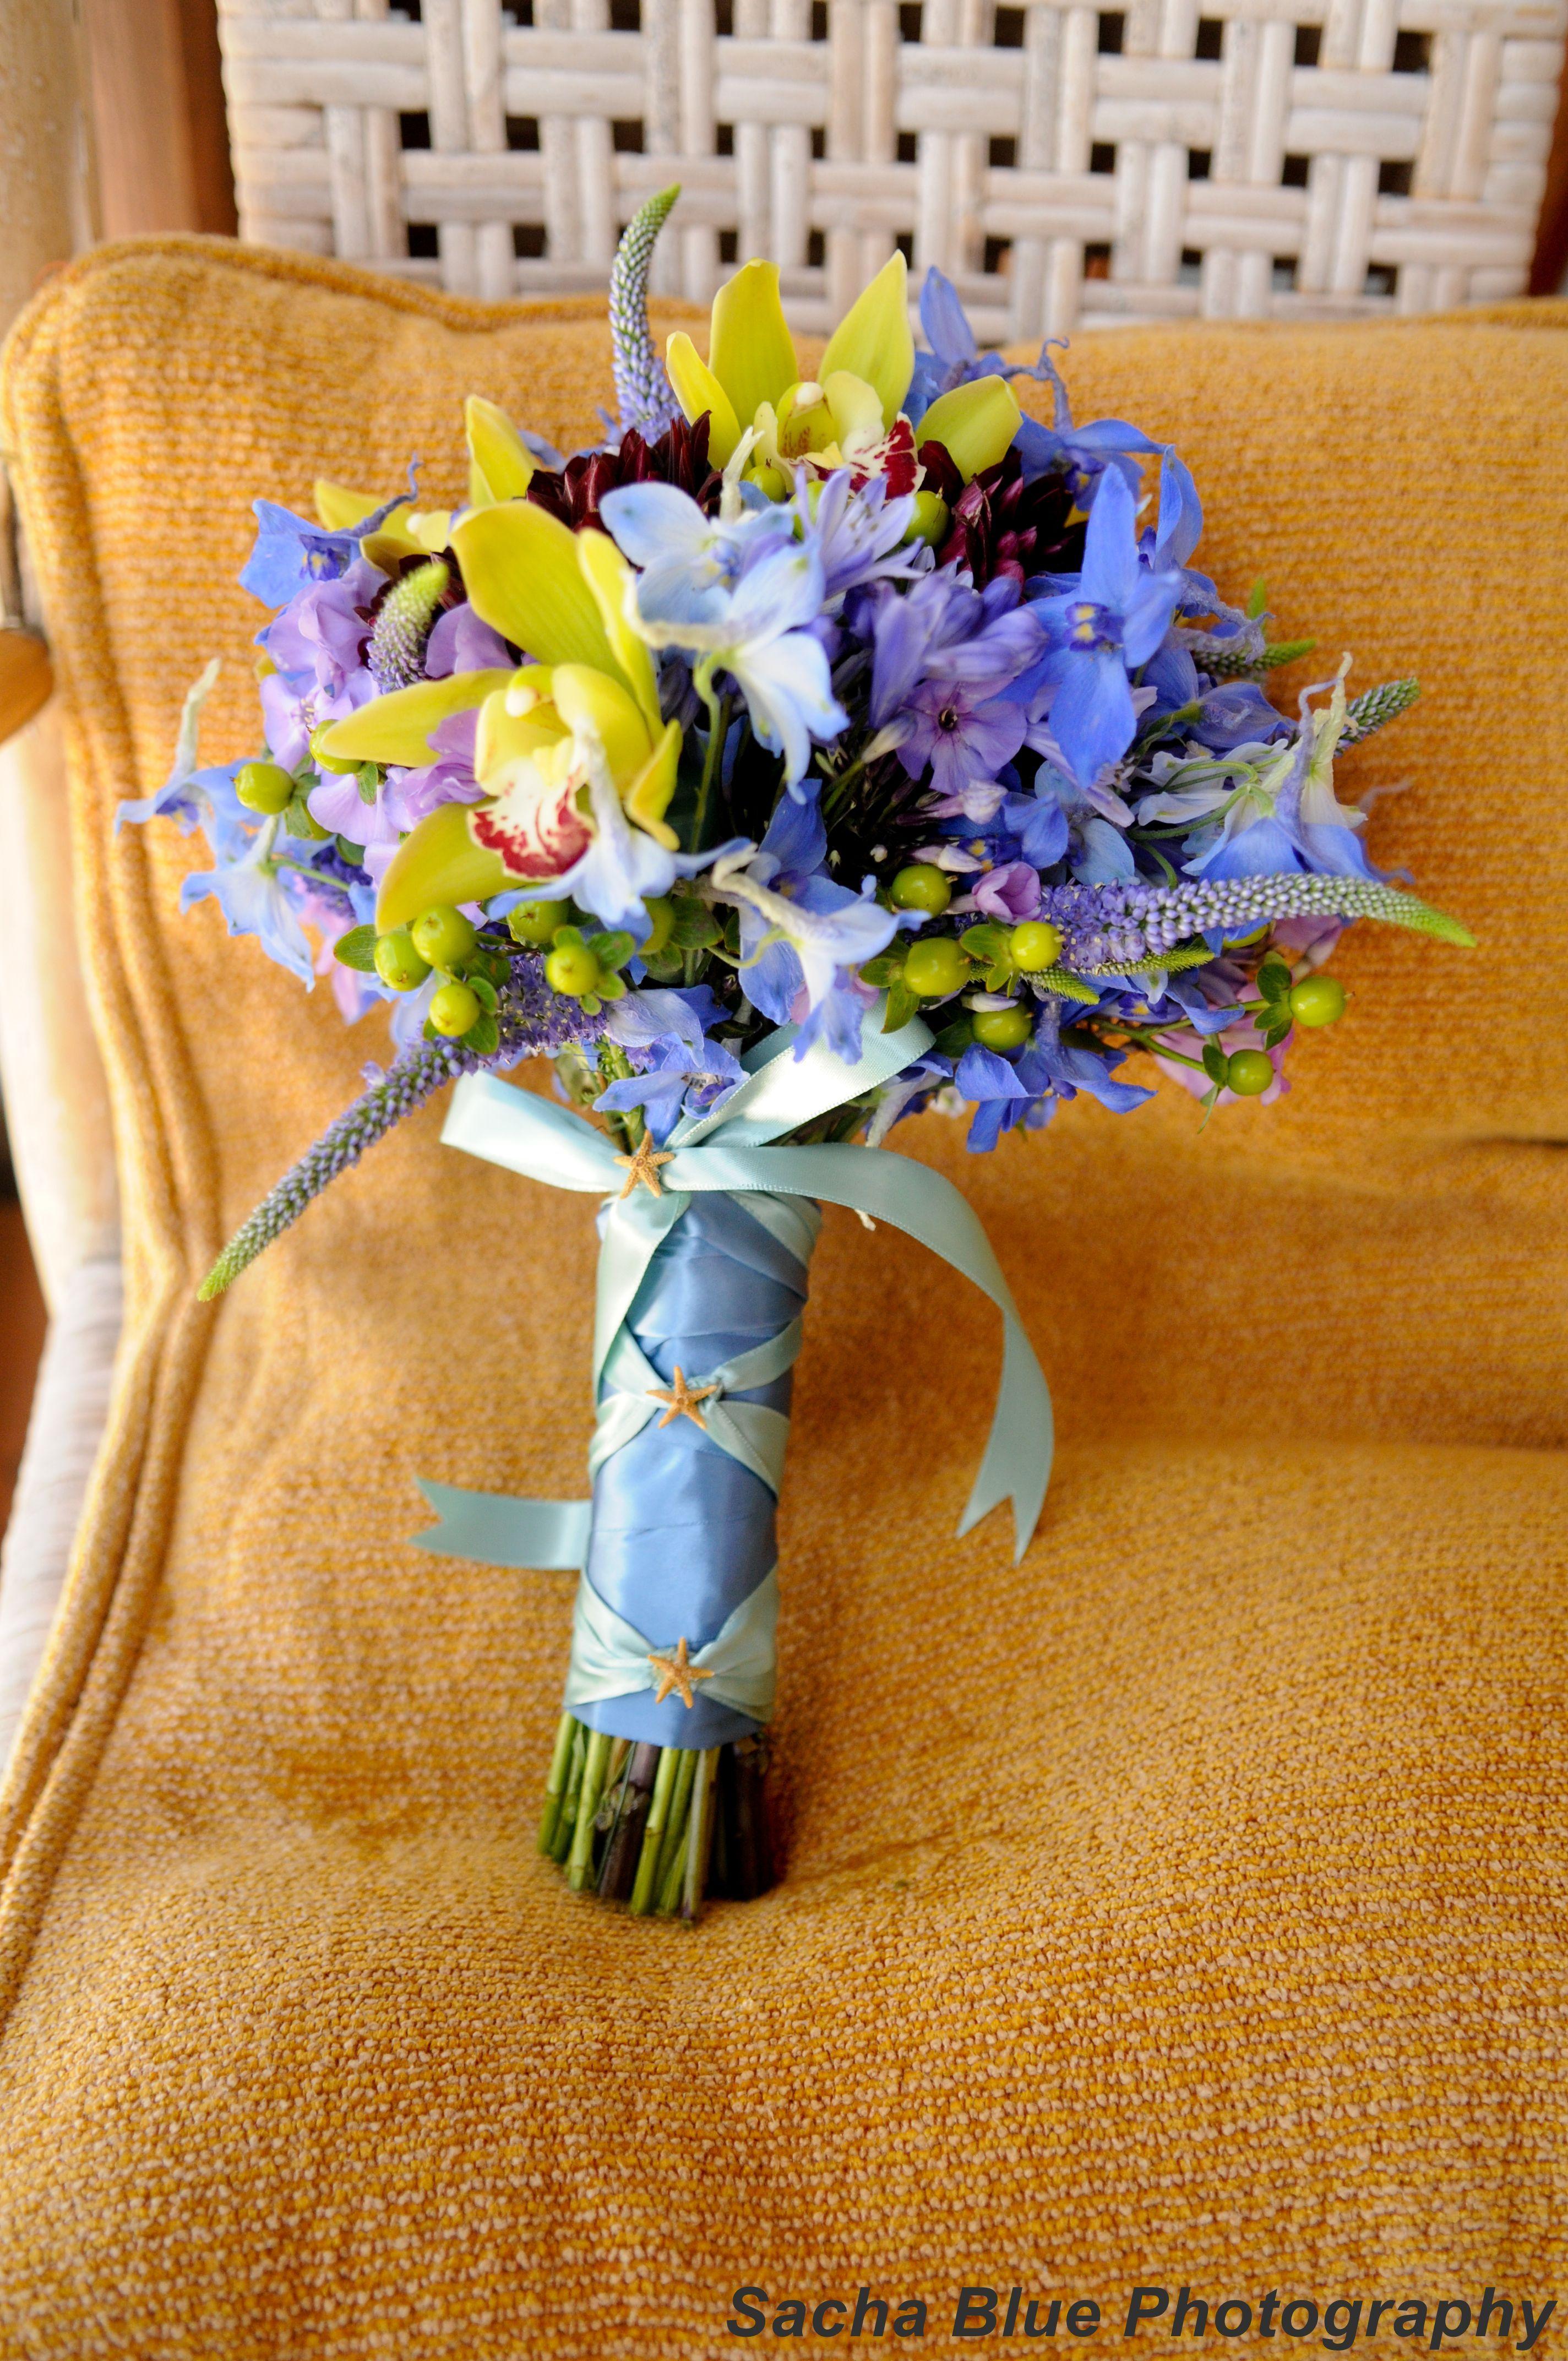 Flowers & Decor, blue, green, Beach, Bride Bouquets, Bride, Flowers, Beach Wedding Flowers & Decor, Bouquet, Designs by courtney